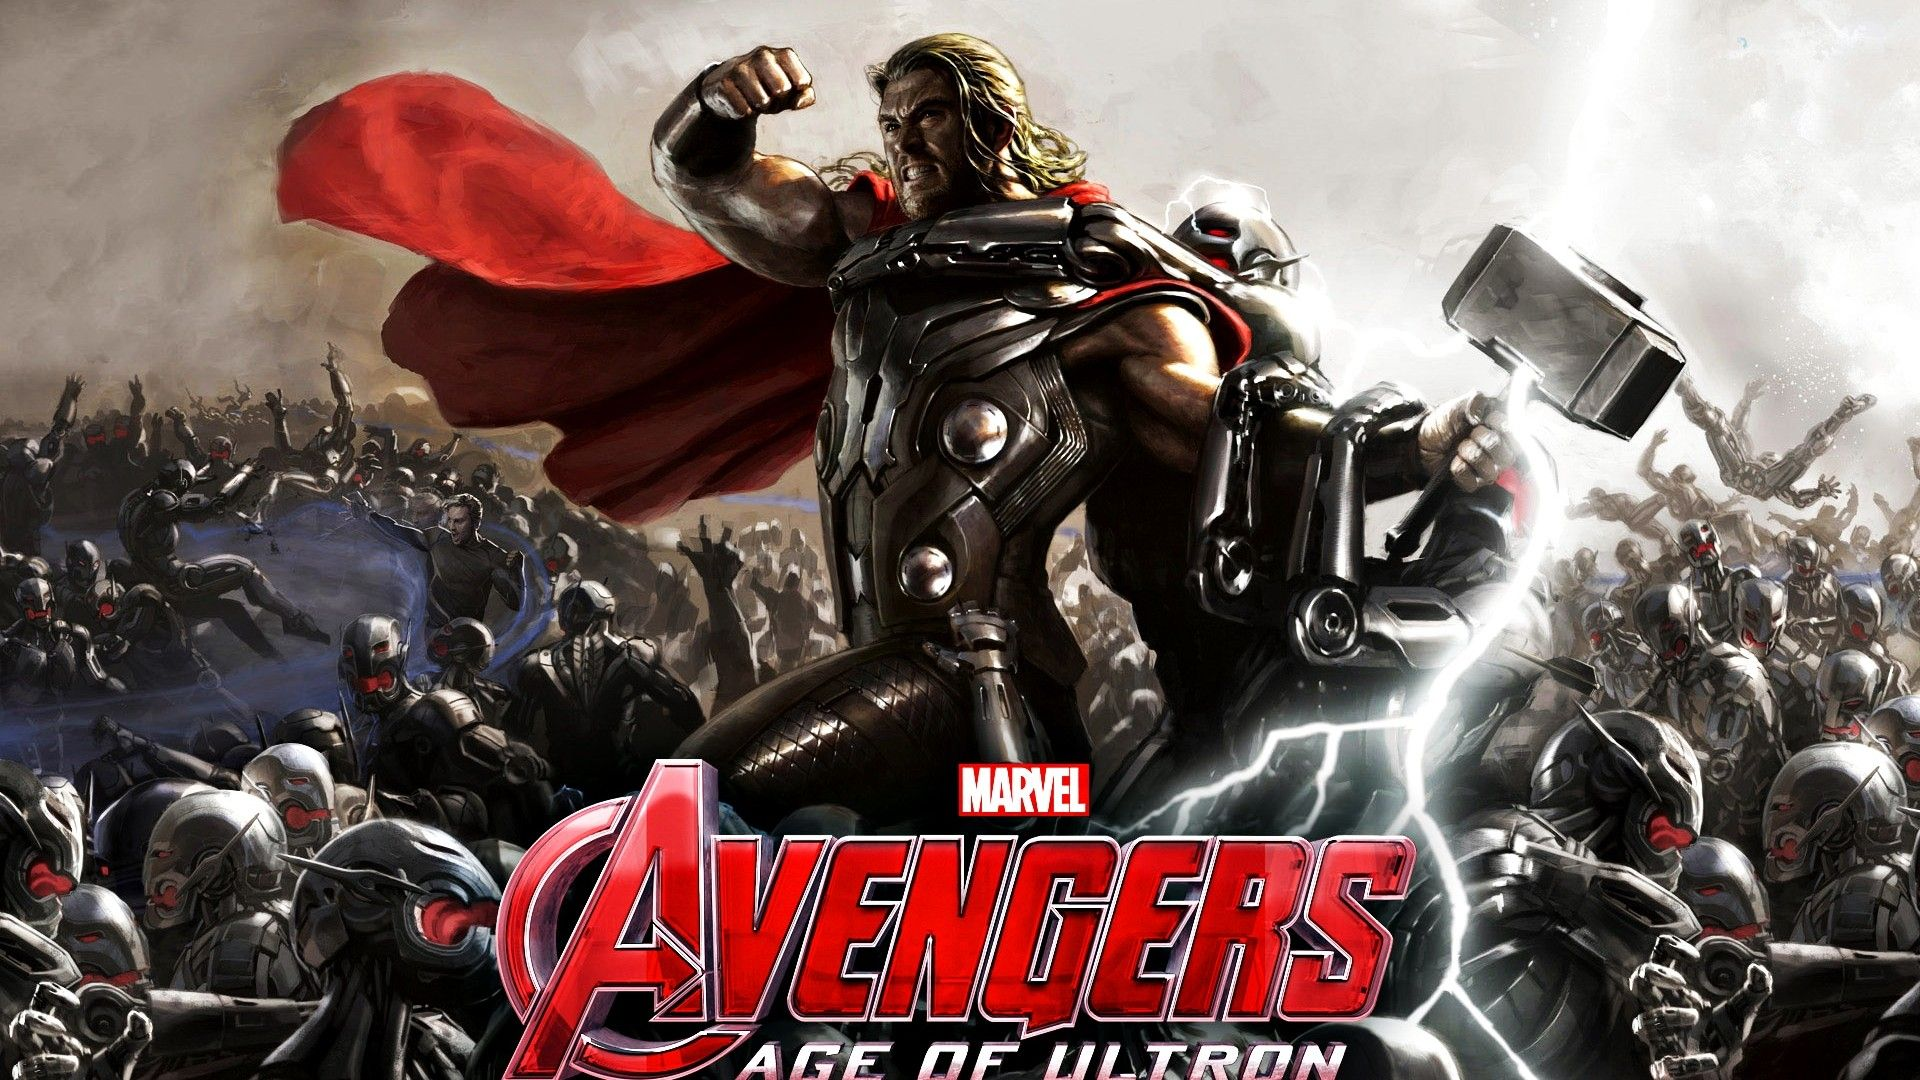 Beautiful Wallpaper Marvel Avengers Age Ultron - d4d15c923110081e46dd141e15f32cfb  Graphic_621641.jpg